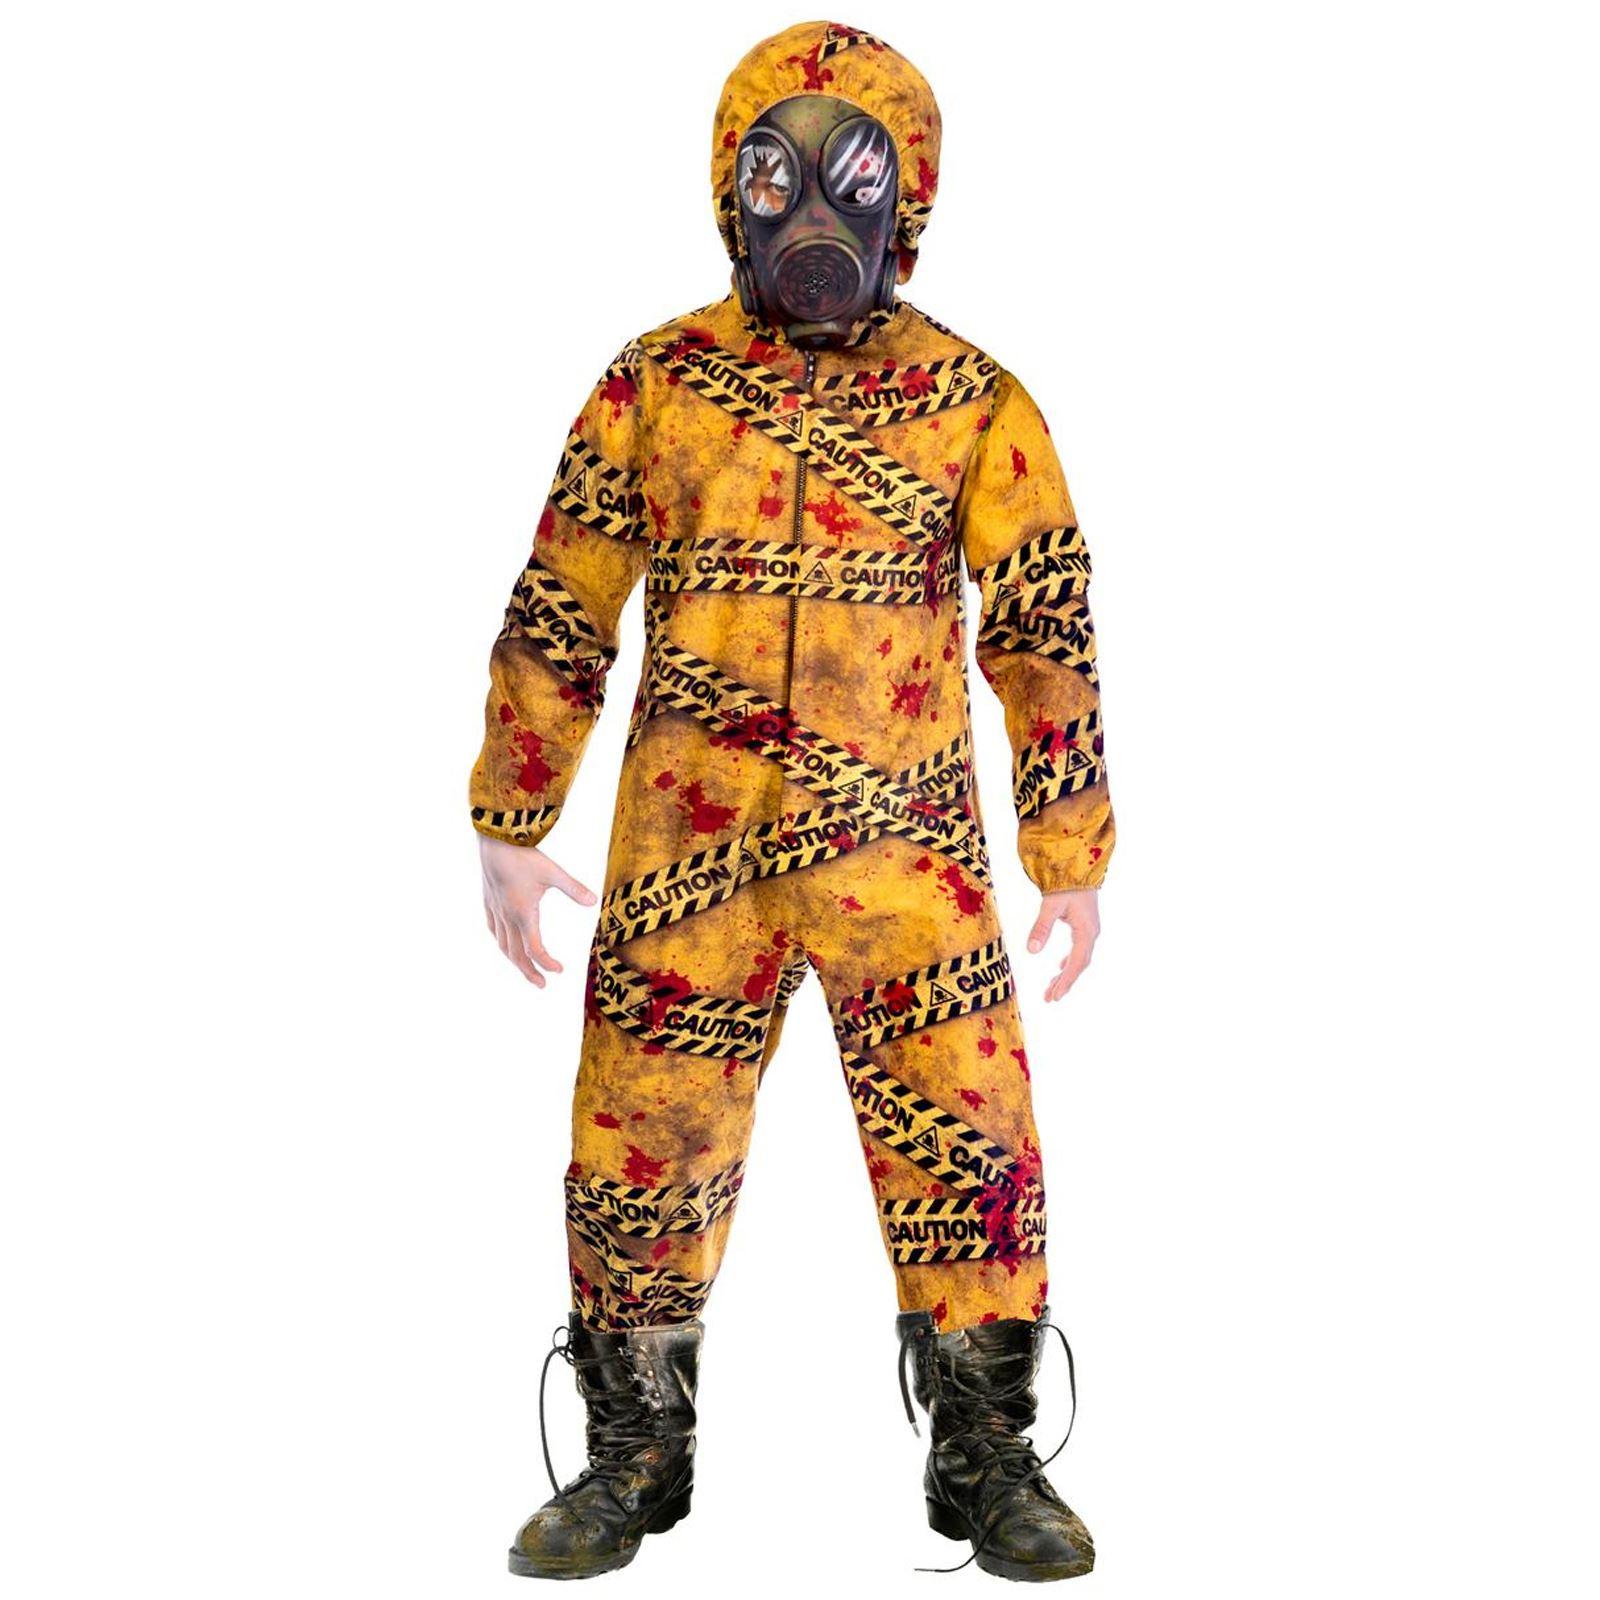 Boys Kids Hazmat Suit Costume Scary Zombie Halloween Fancy Dress ... 396d49223